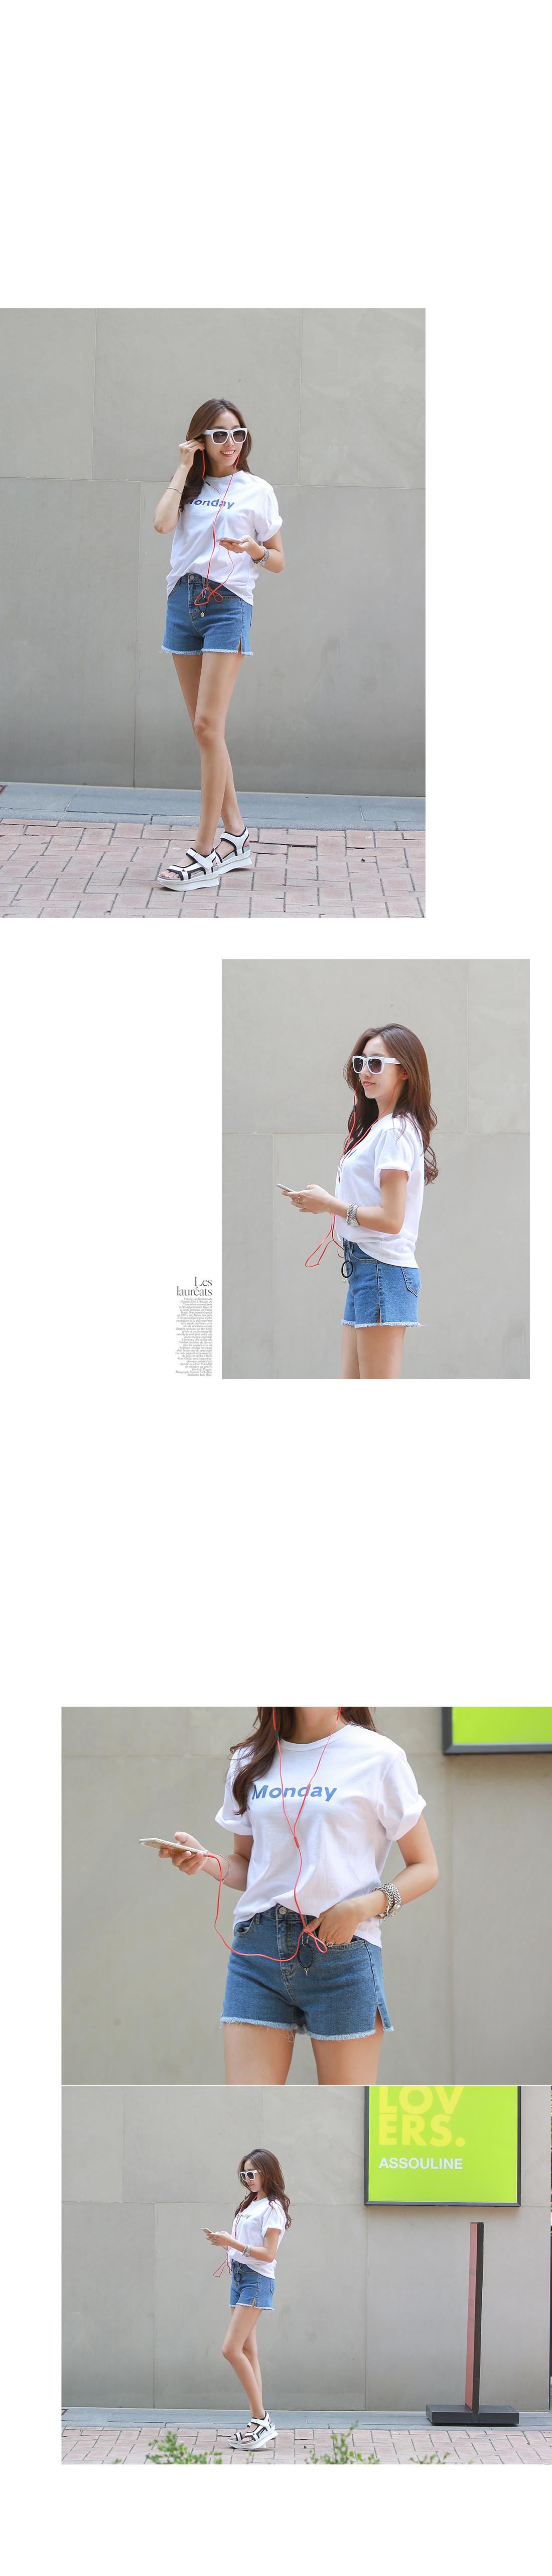 Fanta Seven Days Short Sleeve T-Shirt #103894